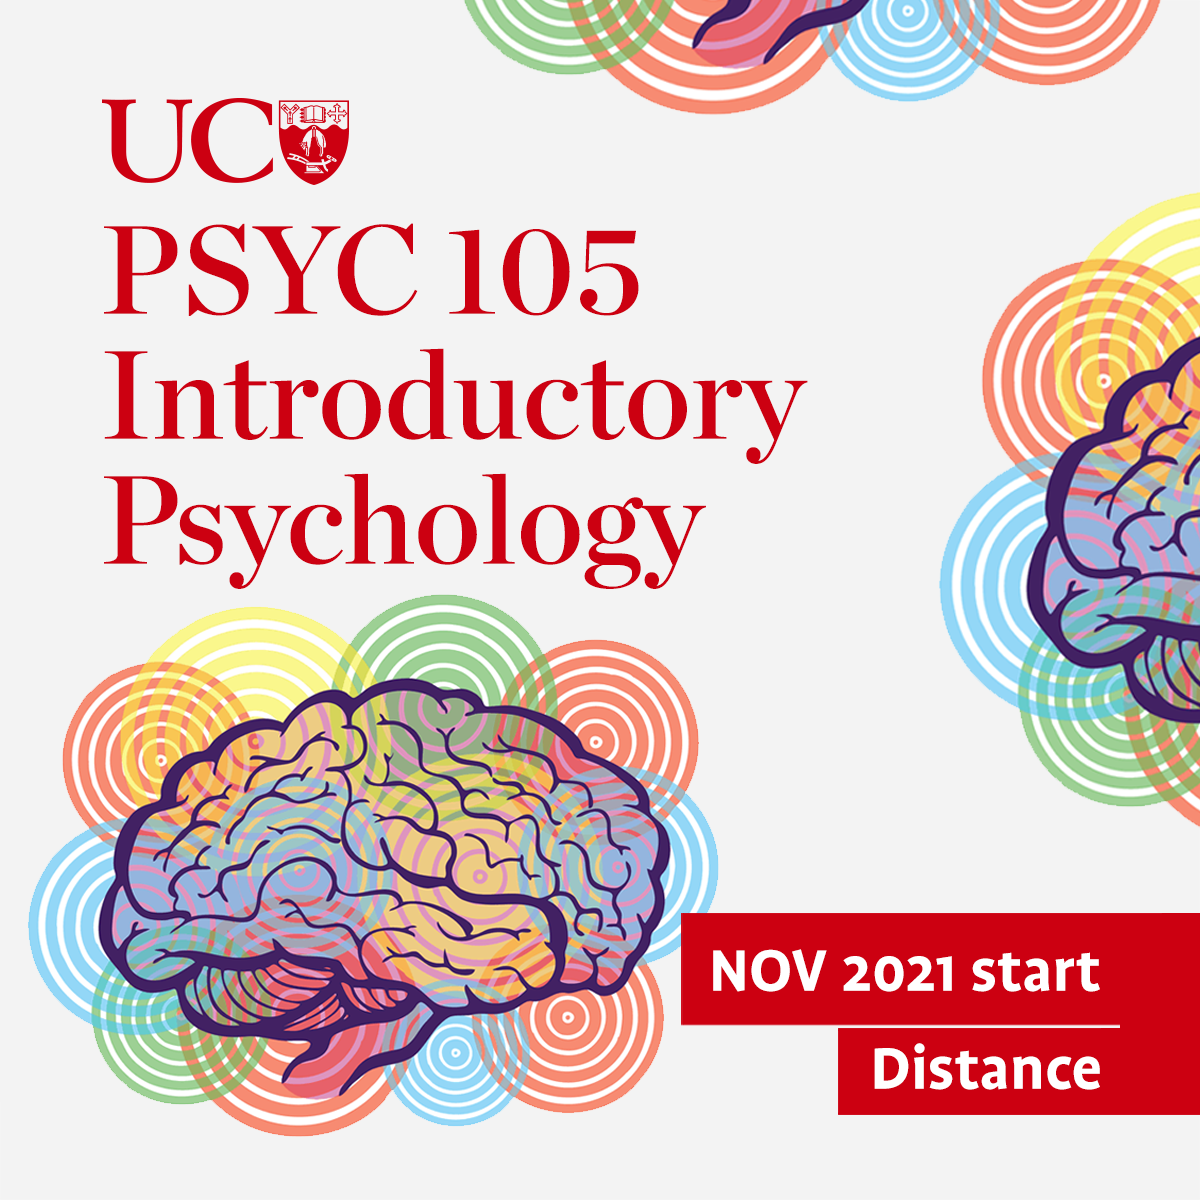 psyc 105